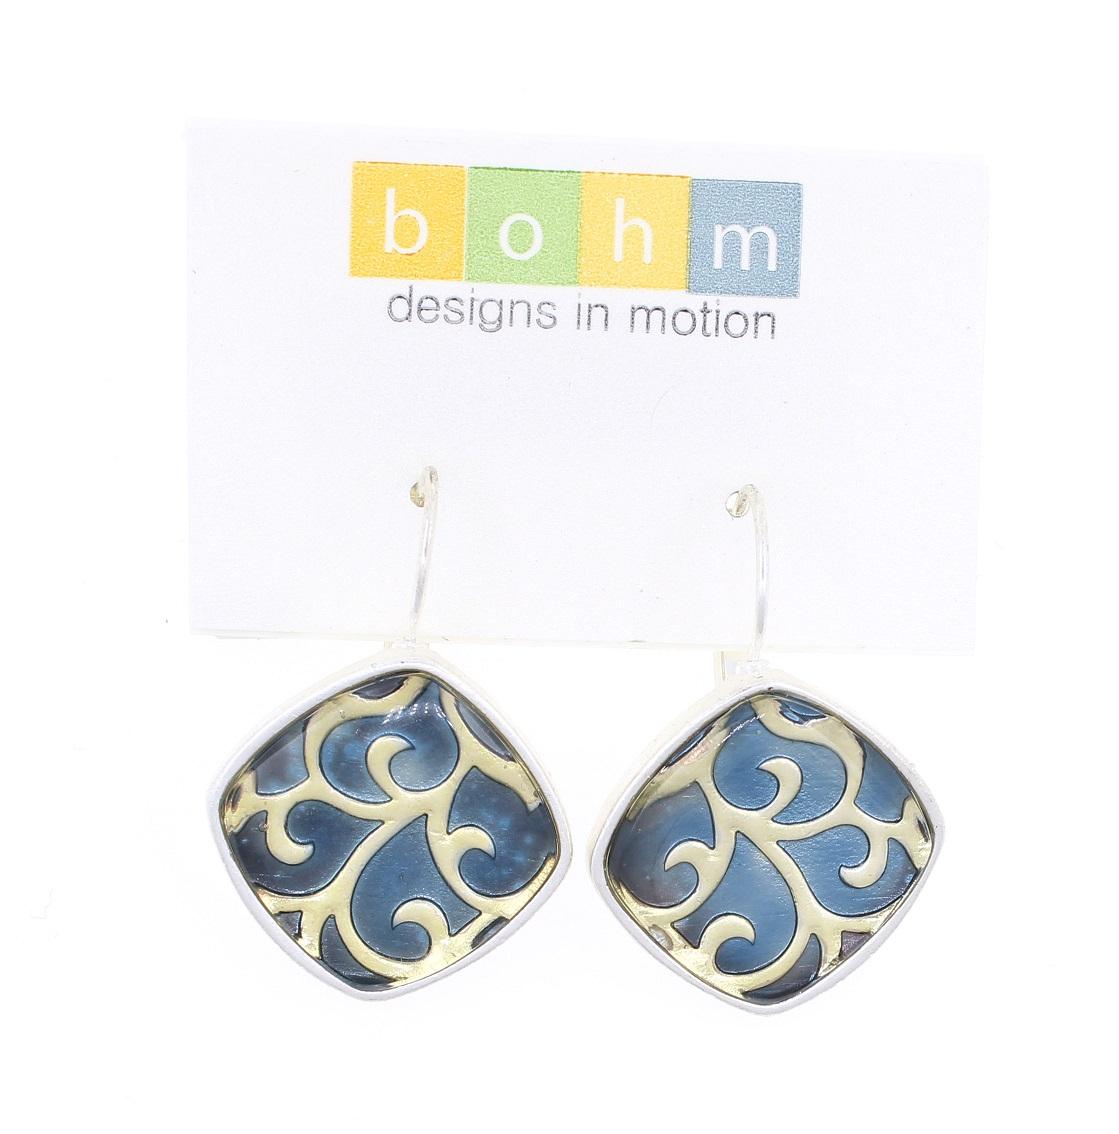 Bohm - City Chic - Square Panel Earrings - Silver/Blue BNWT